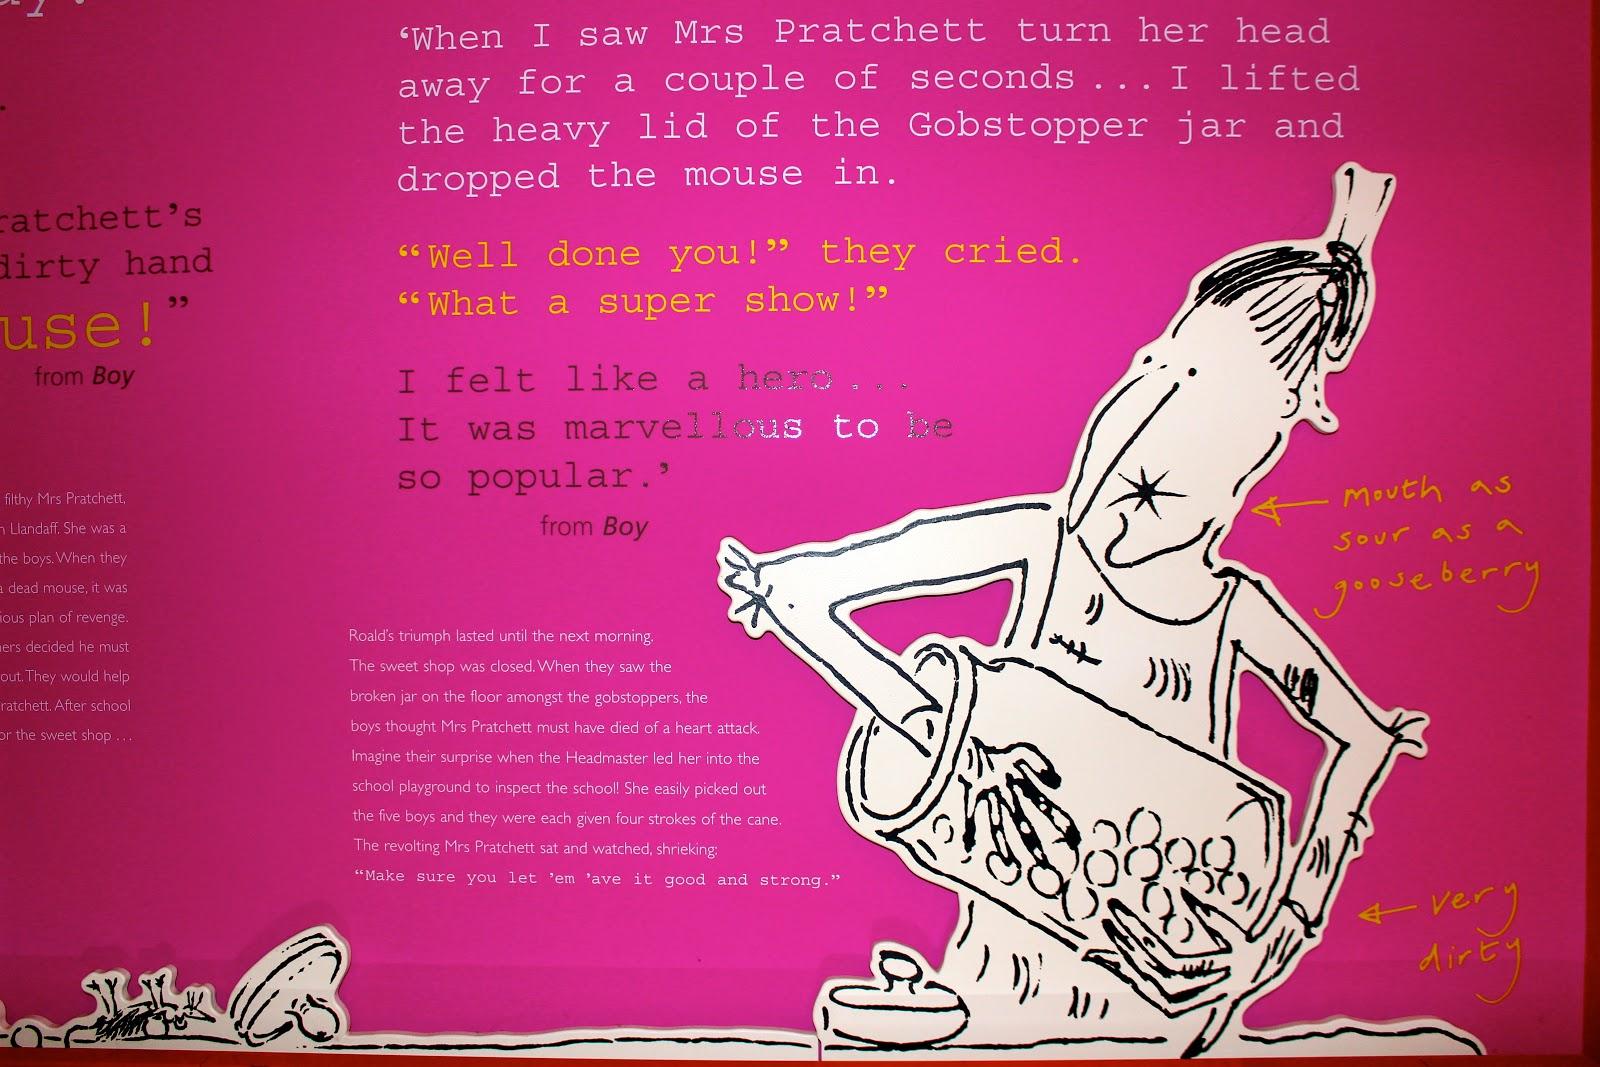 Boy (Roald Dahl)